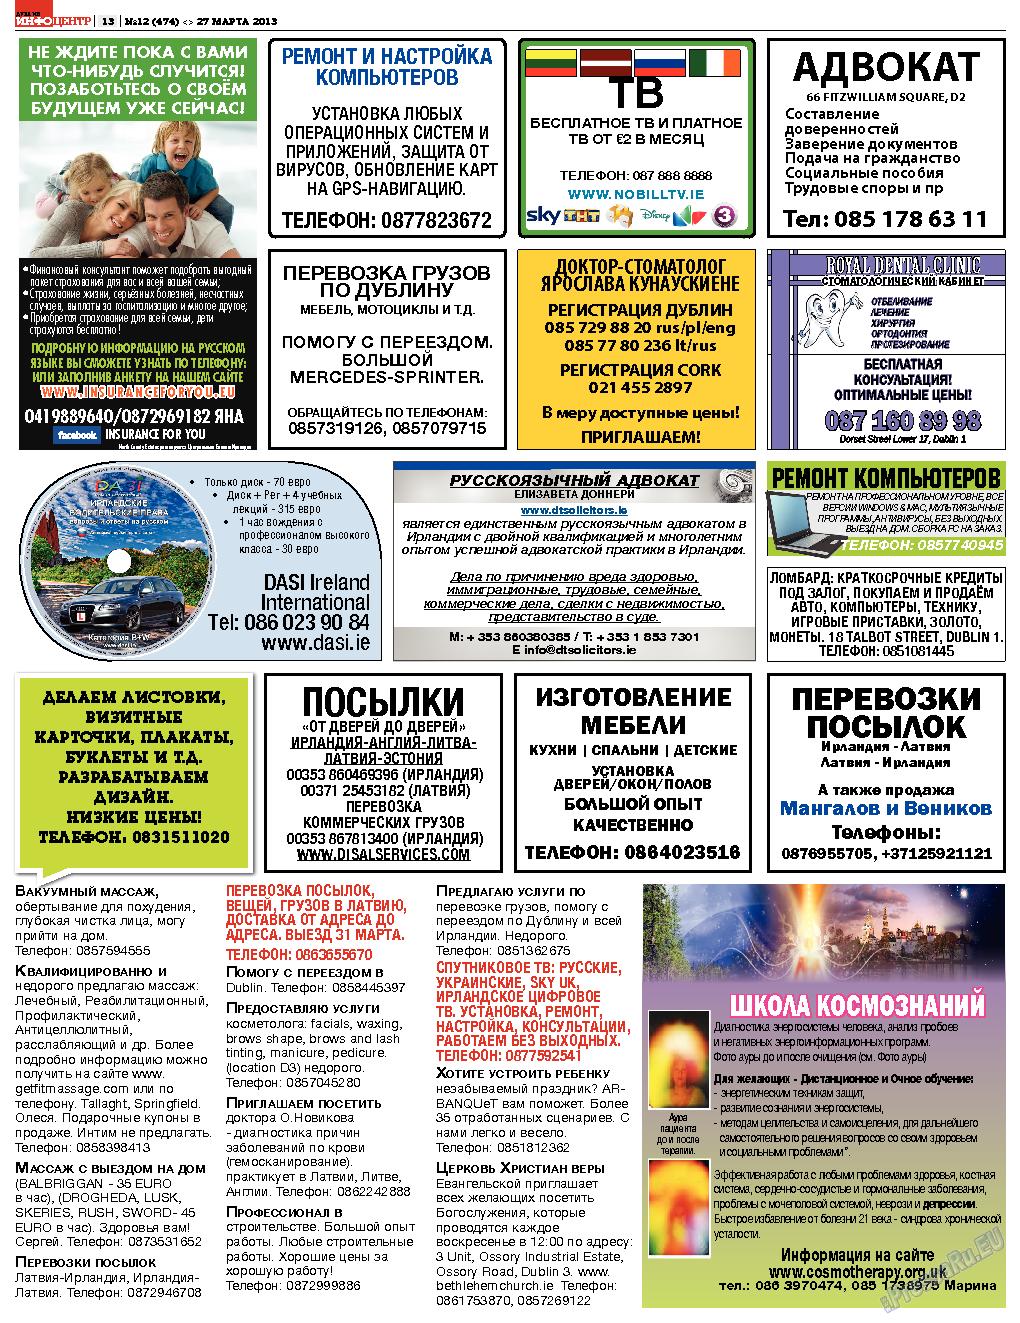 Дублин инфоцентр (газета). 2013 год, номер 12, стр. 13